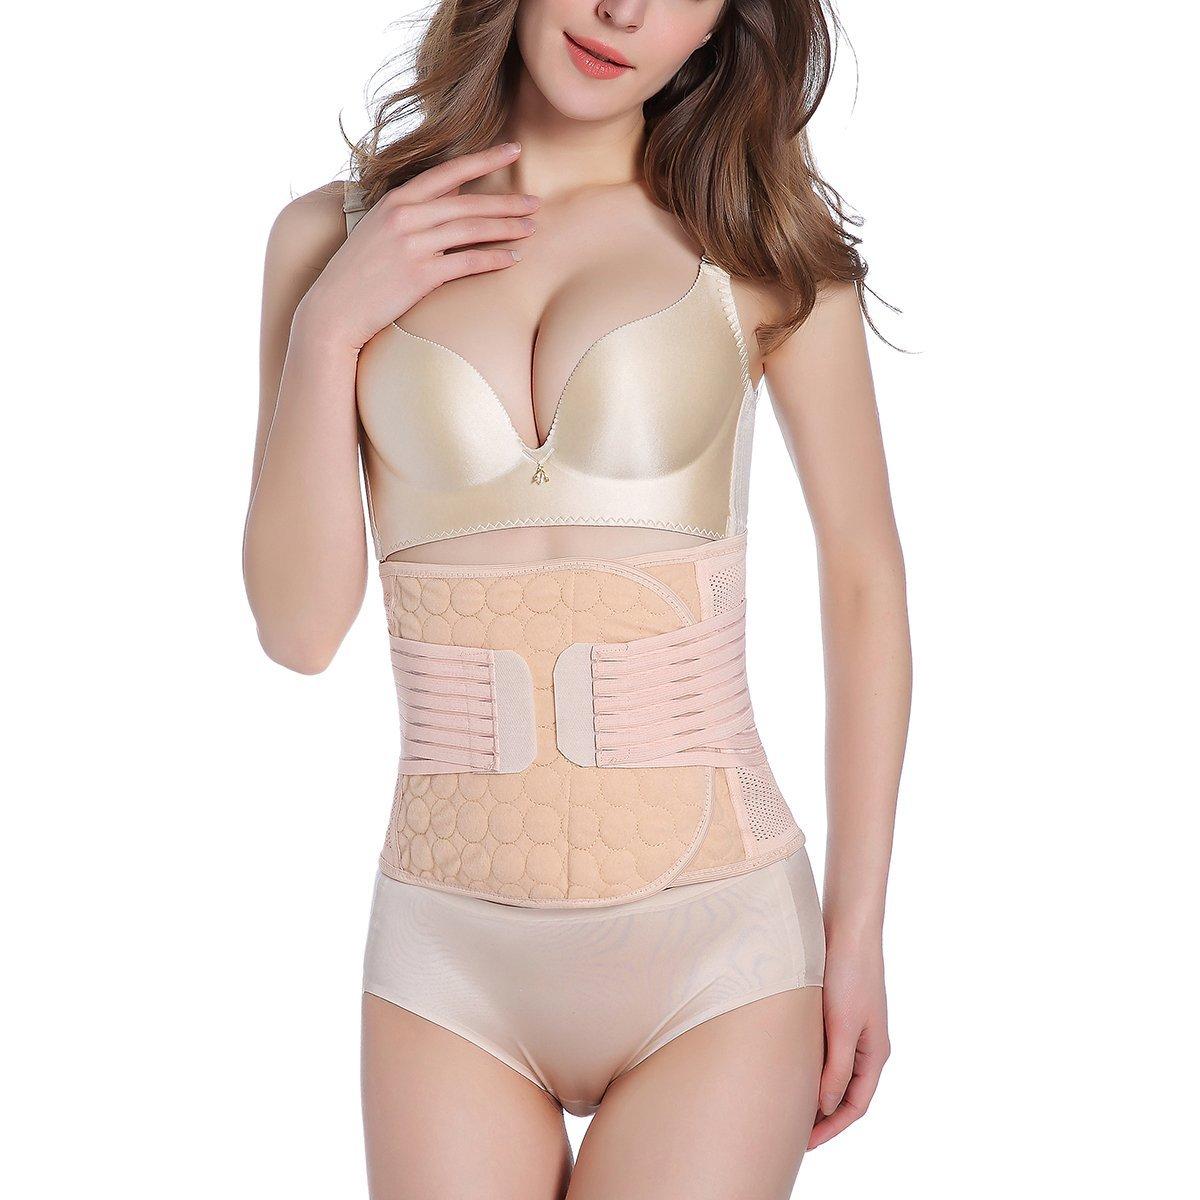 82bd2e93d64 Get Quotations · She-Lin Postpartum Support - Recovery Belly Waist Pelvis Belt  Shapewear - Post